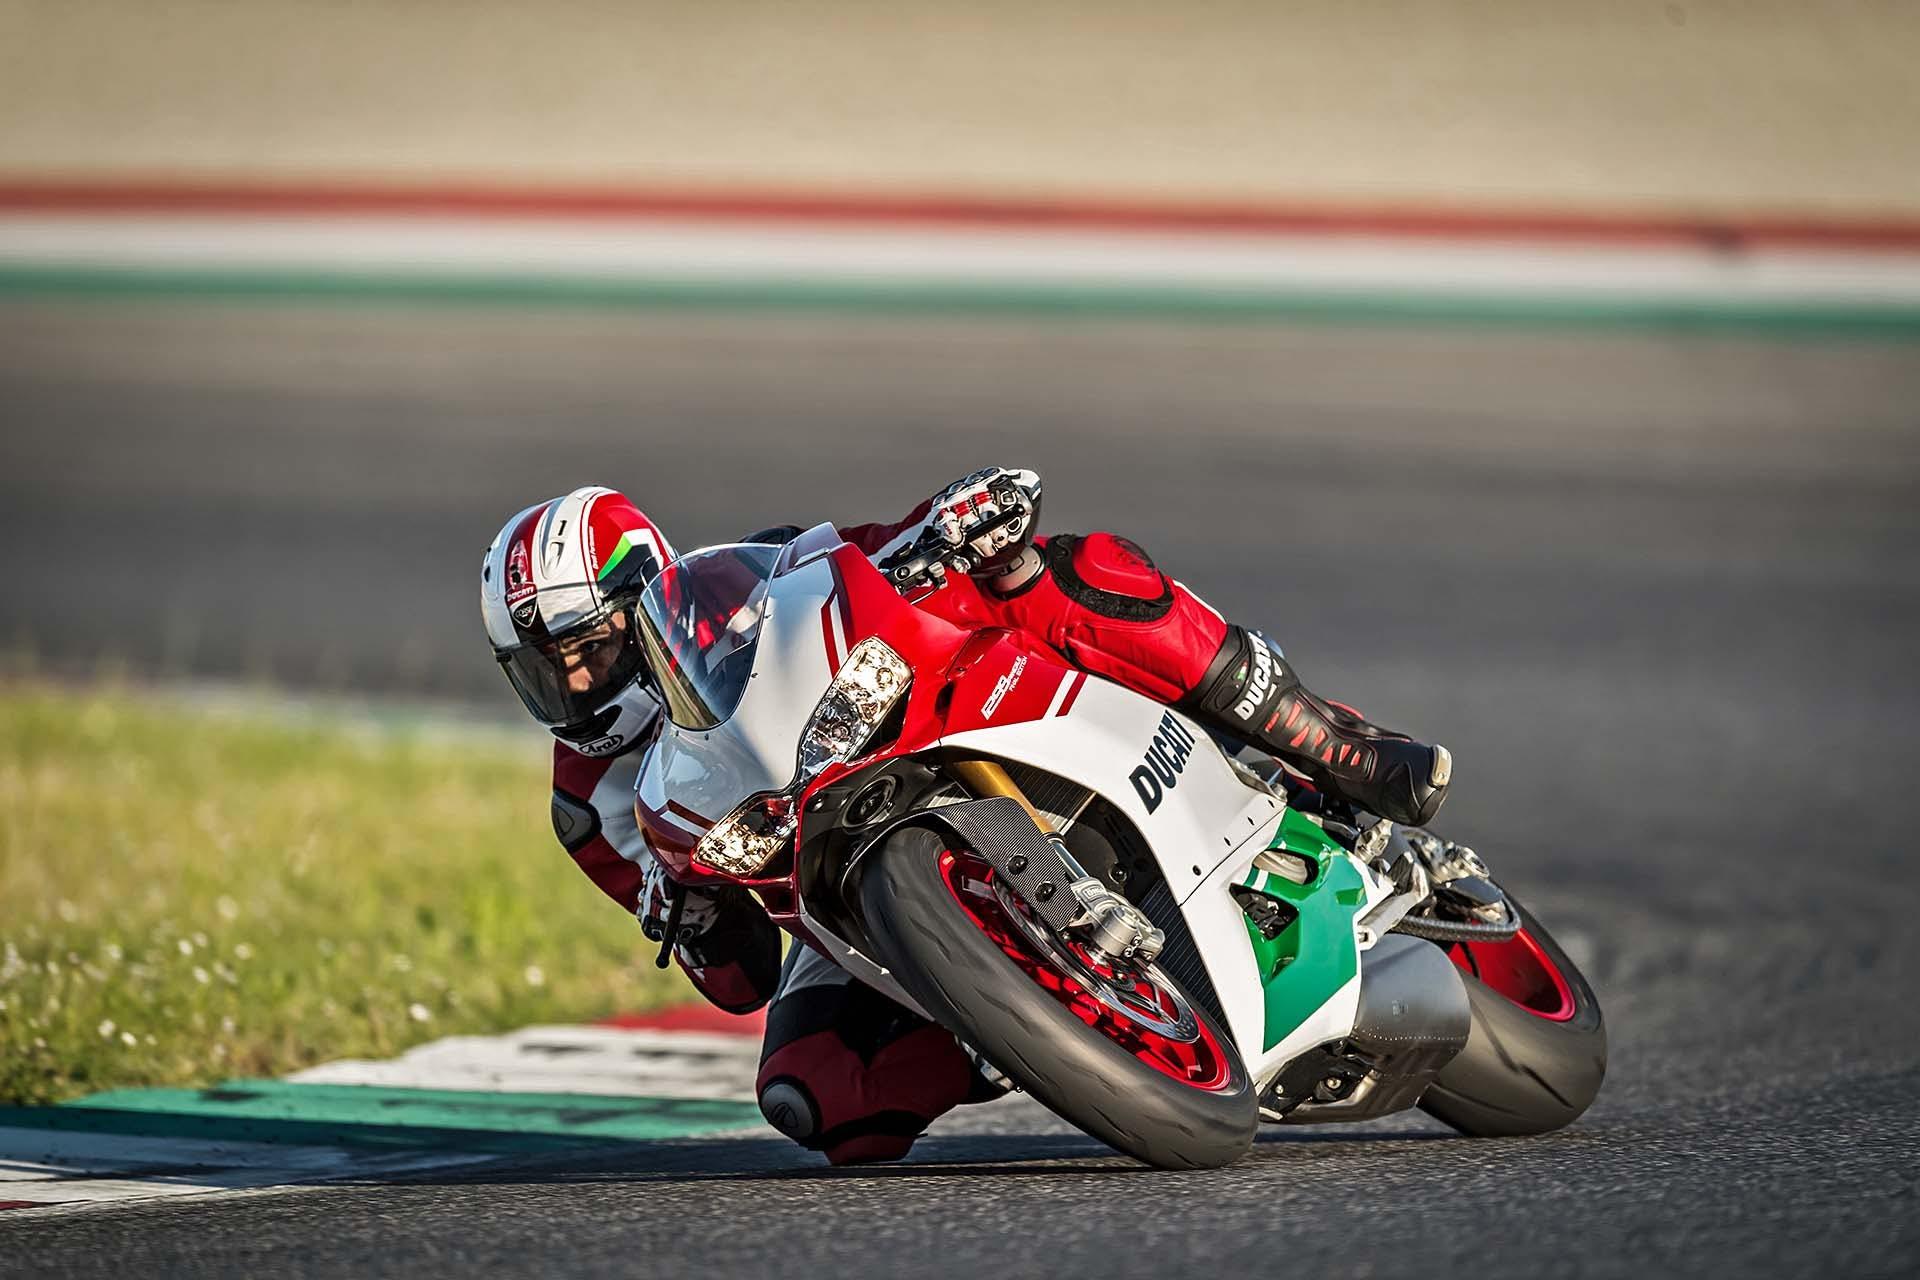 Ducati 1299 Panigale R Final Edition melandri